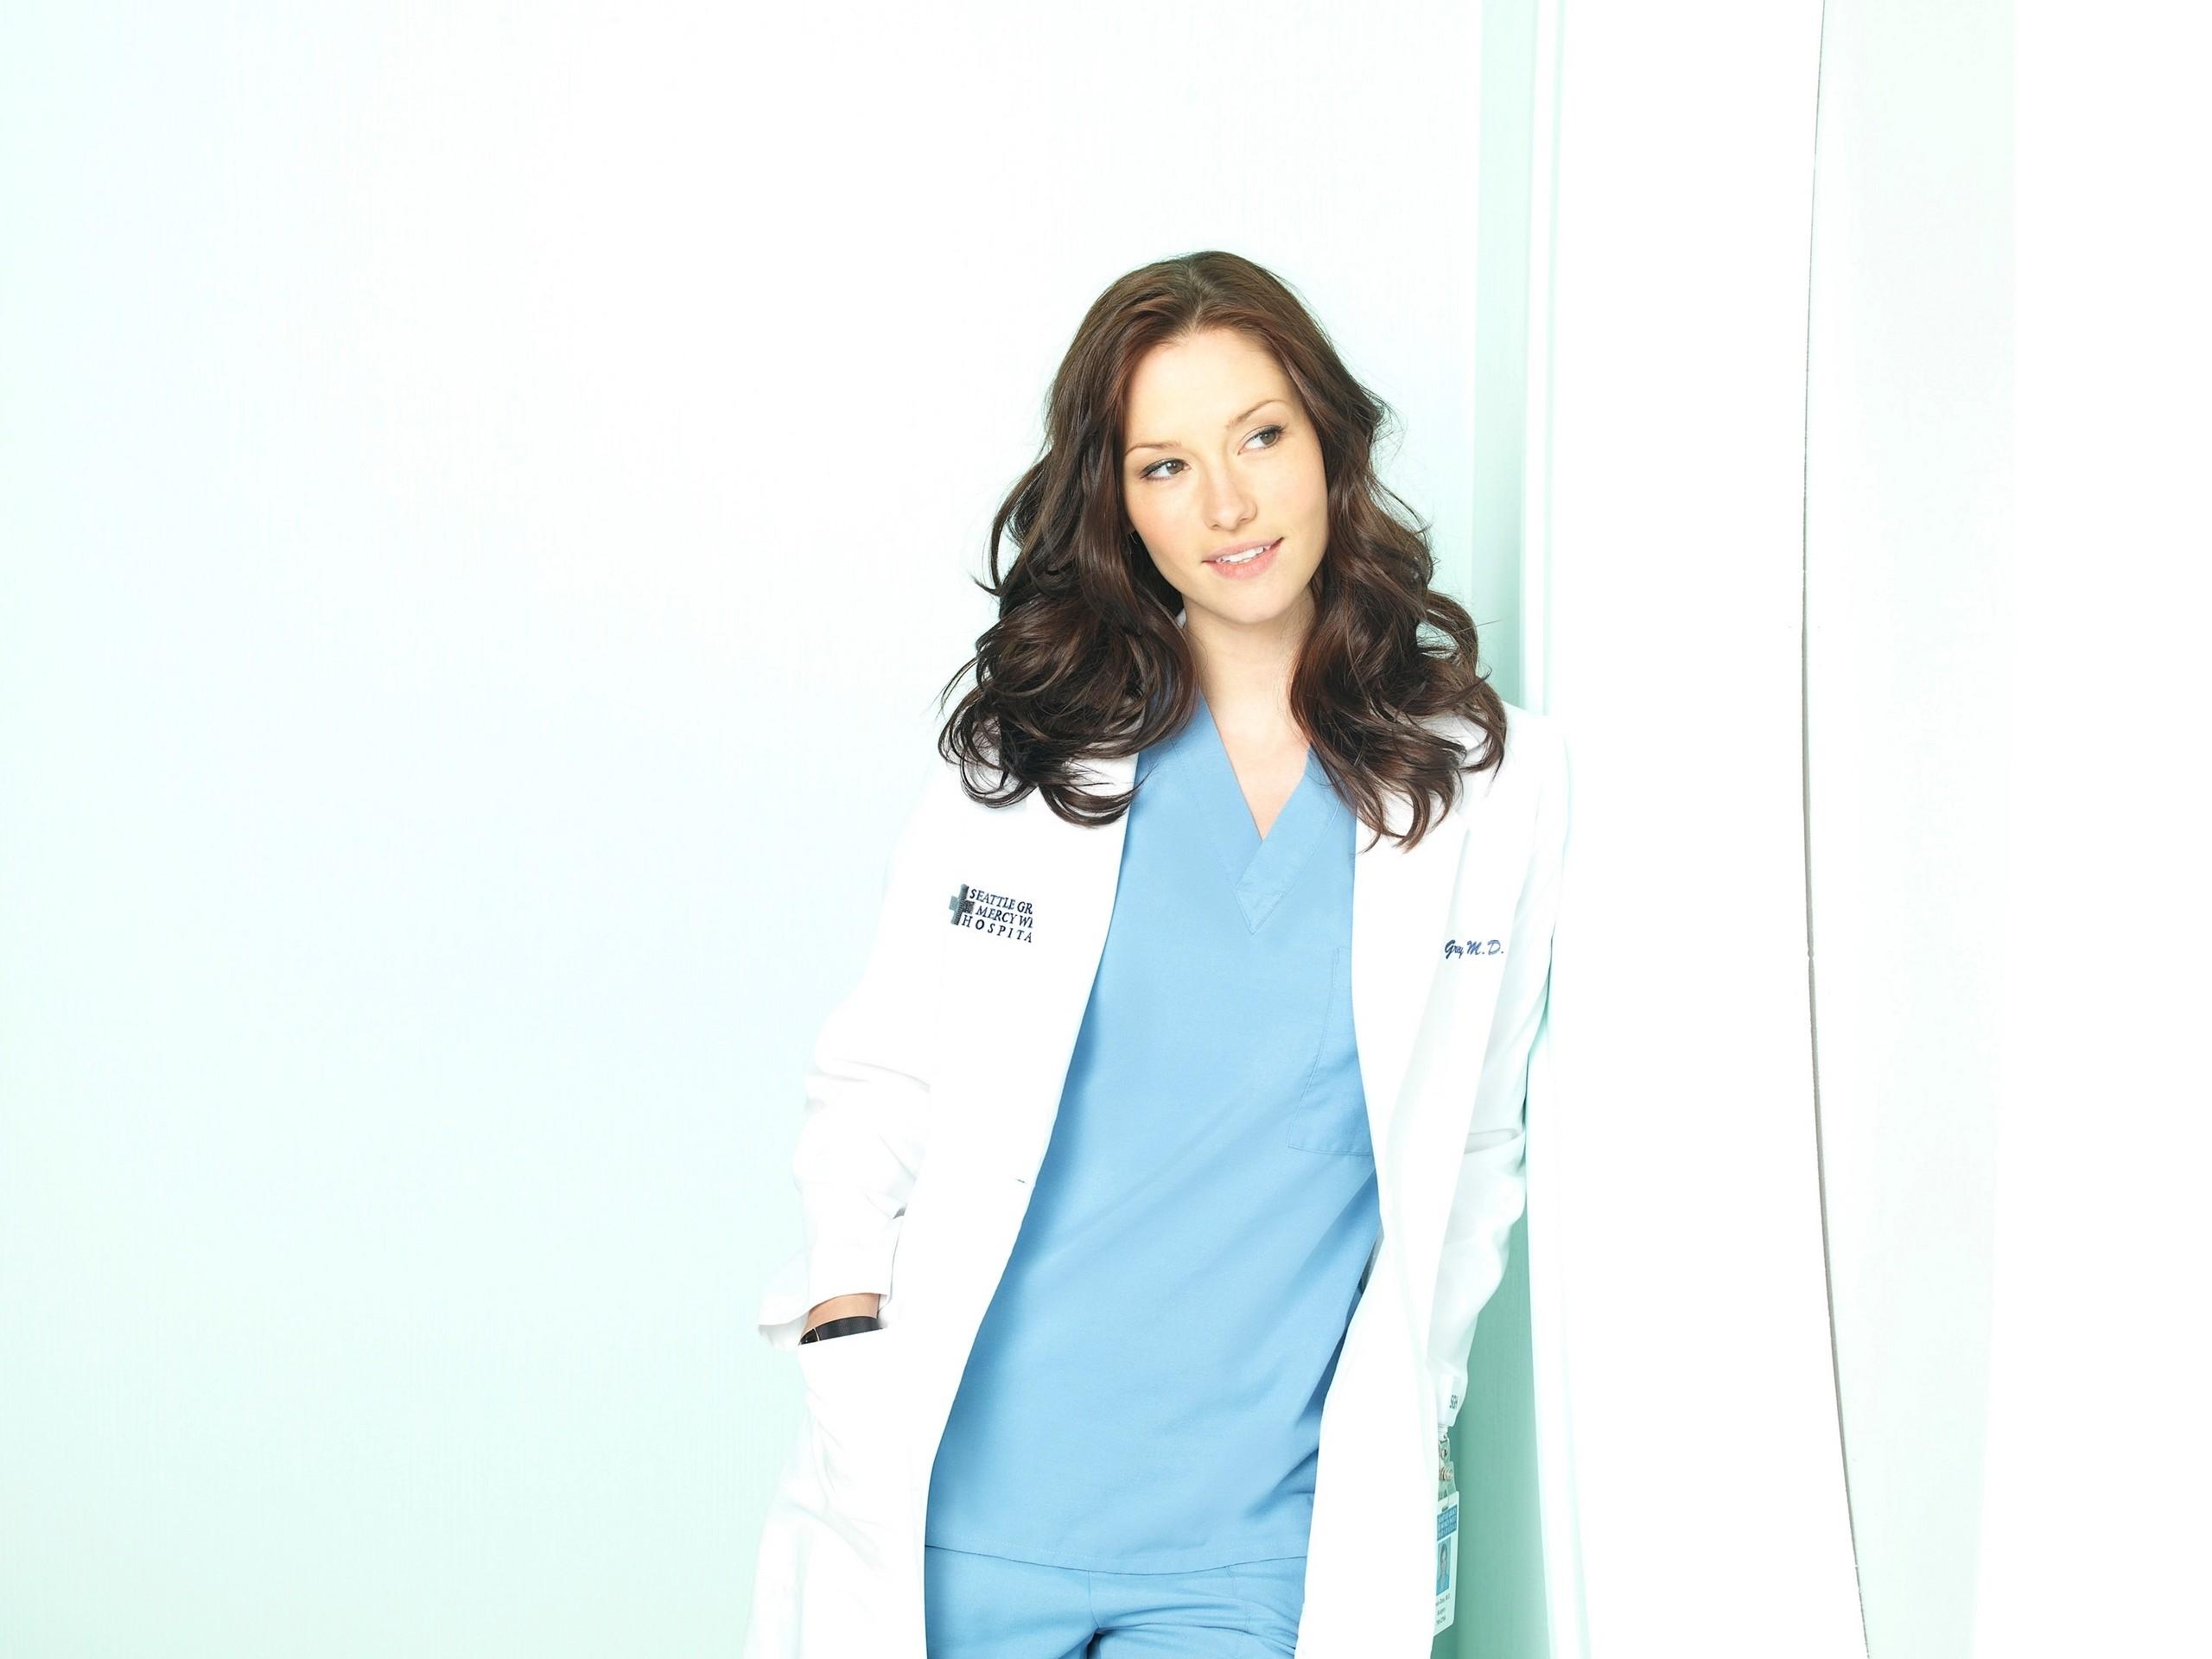 Berühmt Download Greys Anatomy Fotos - Anatomie Ideen - finotti.info